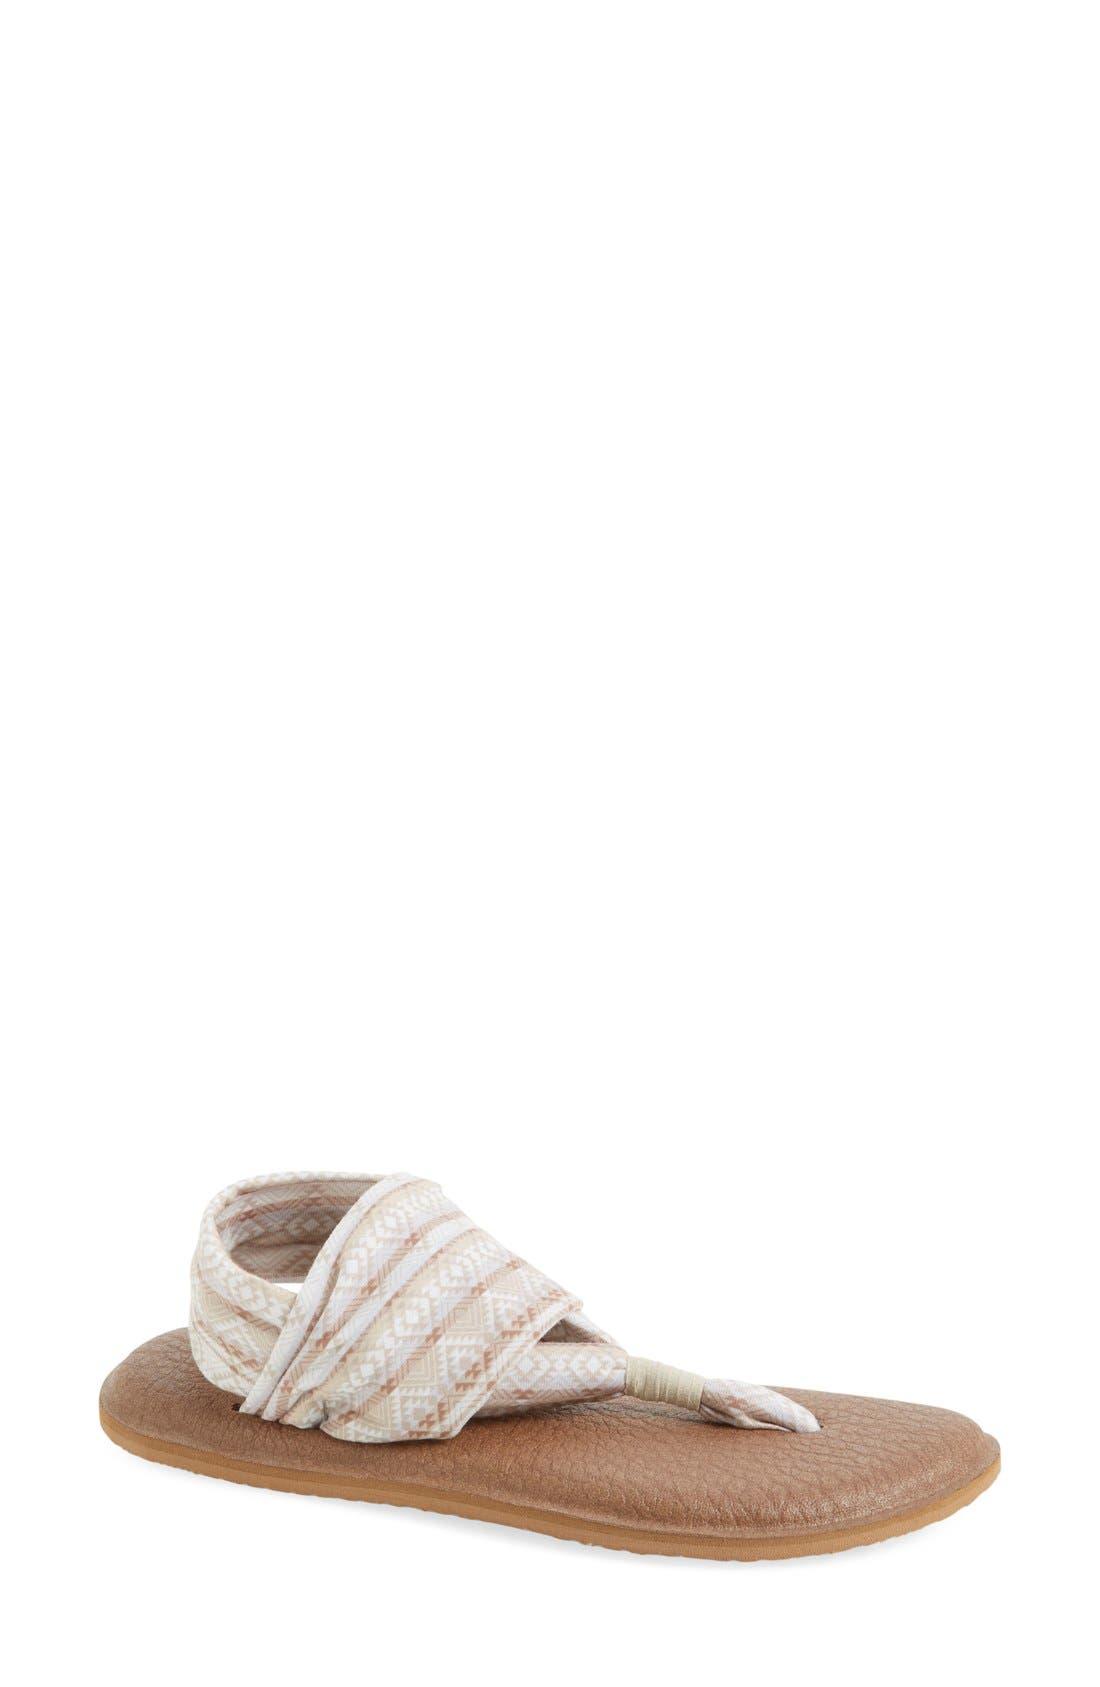 'Yoga Sling 2' Sandal,                             Main thumbnail 13, color,